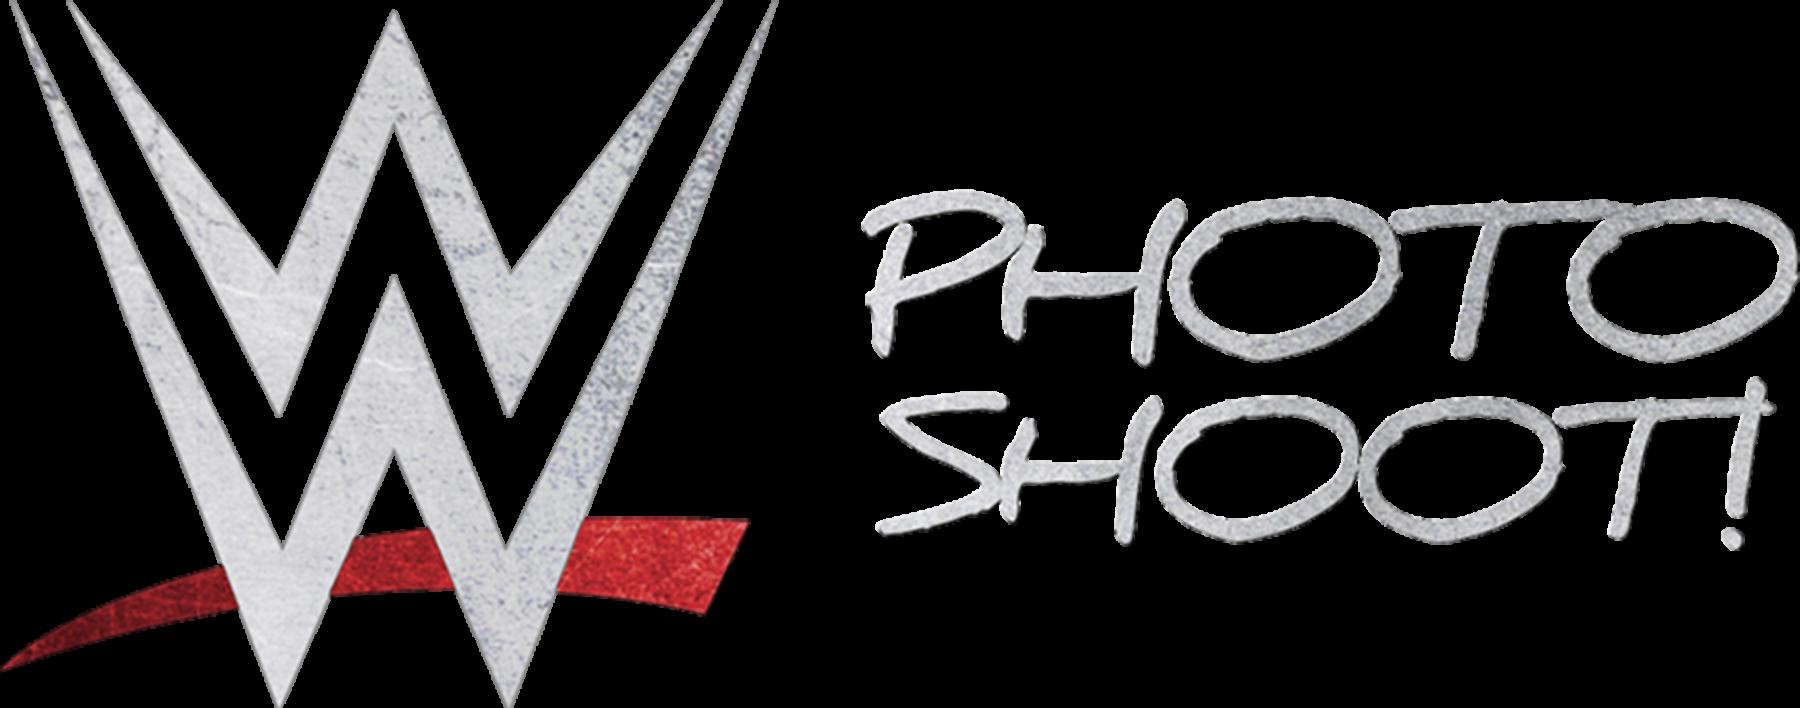 WWE Photo Shoot